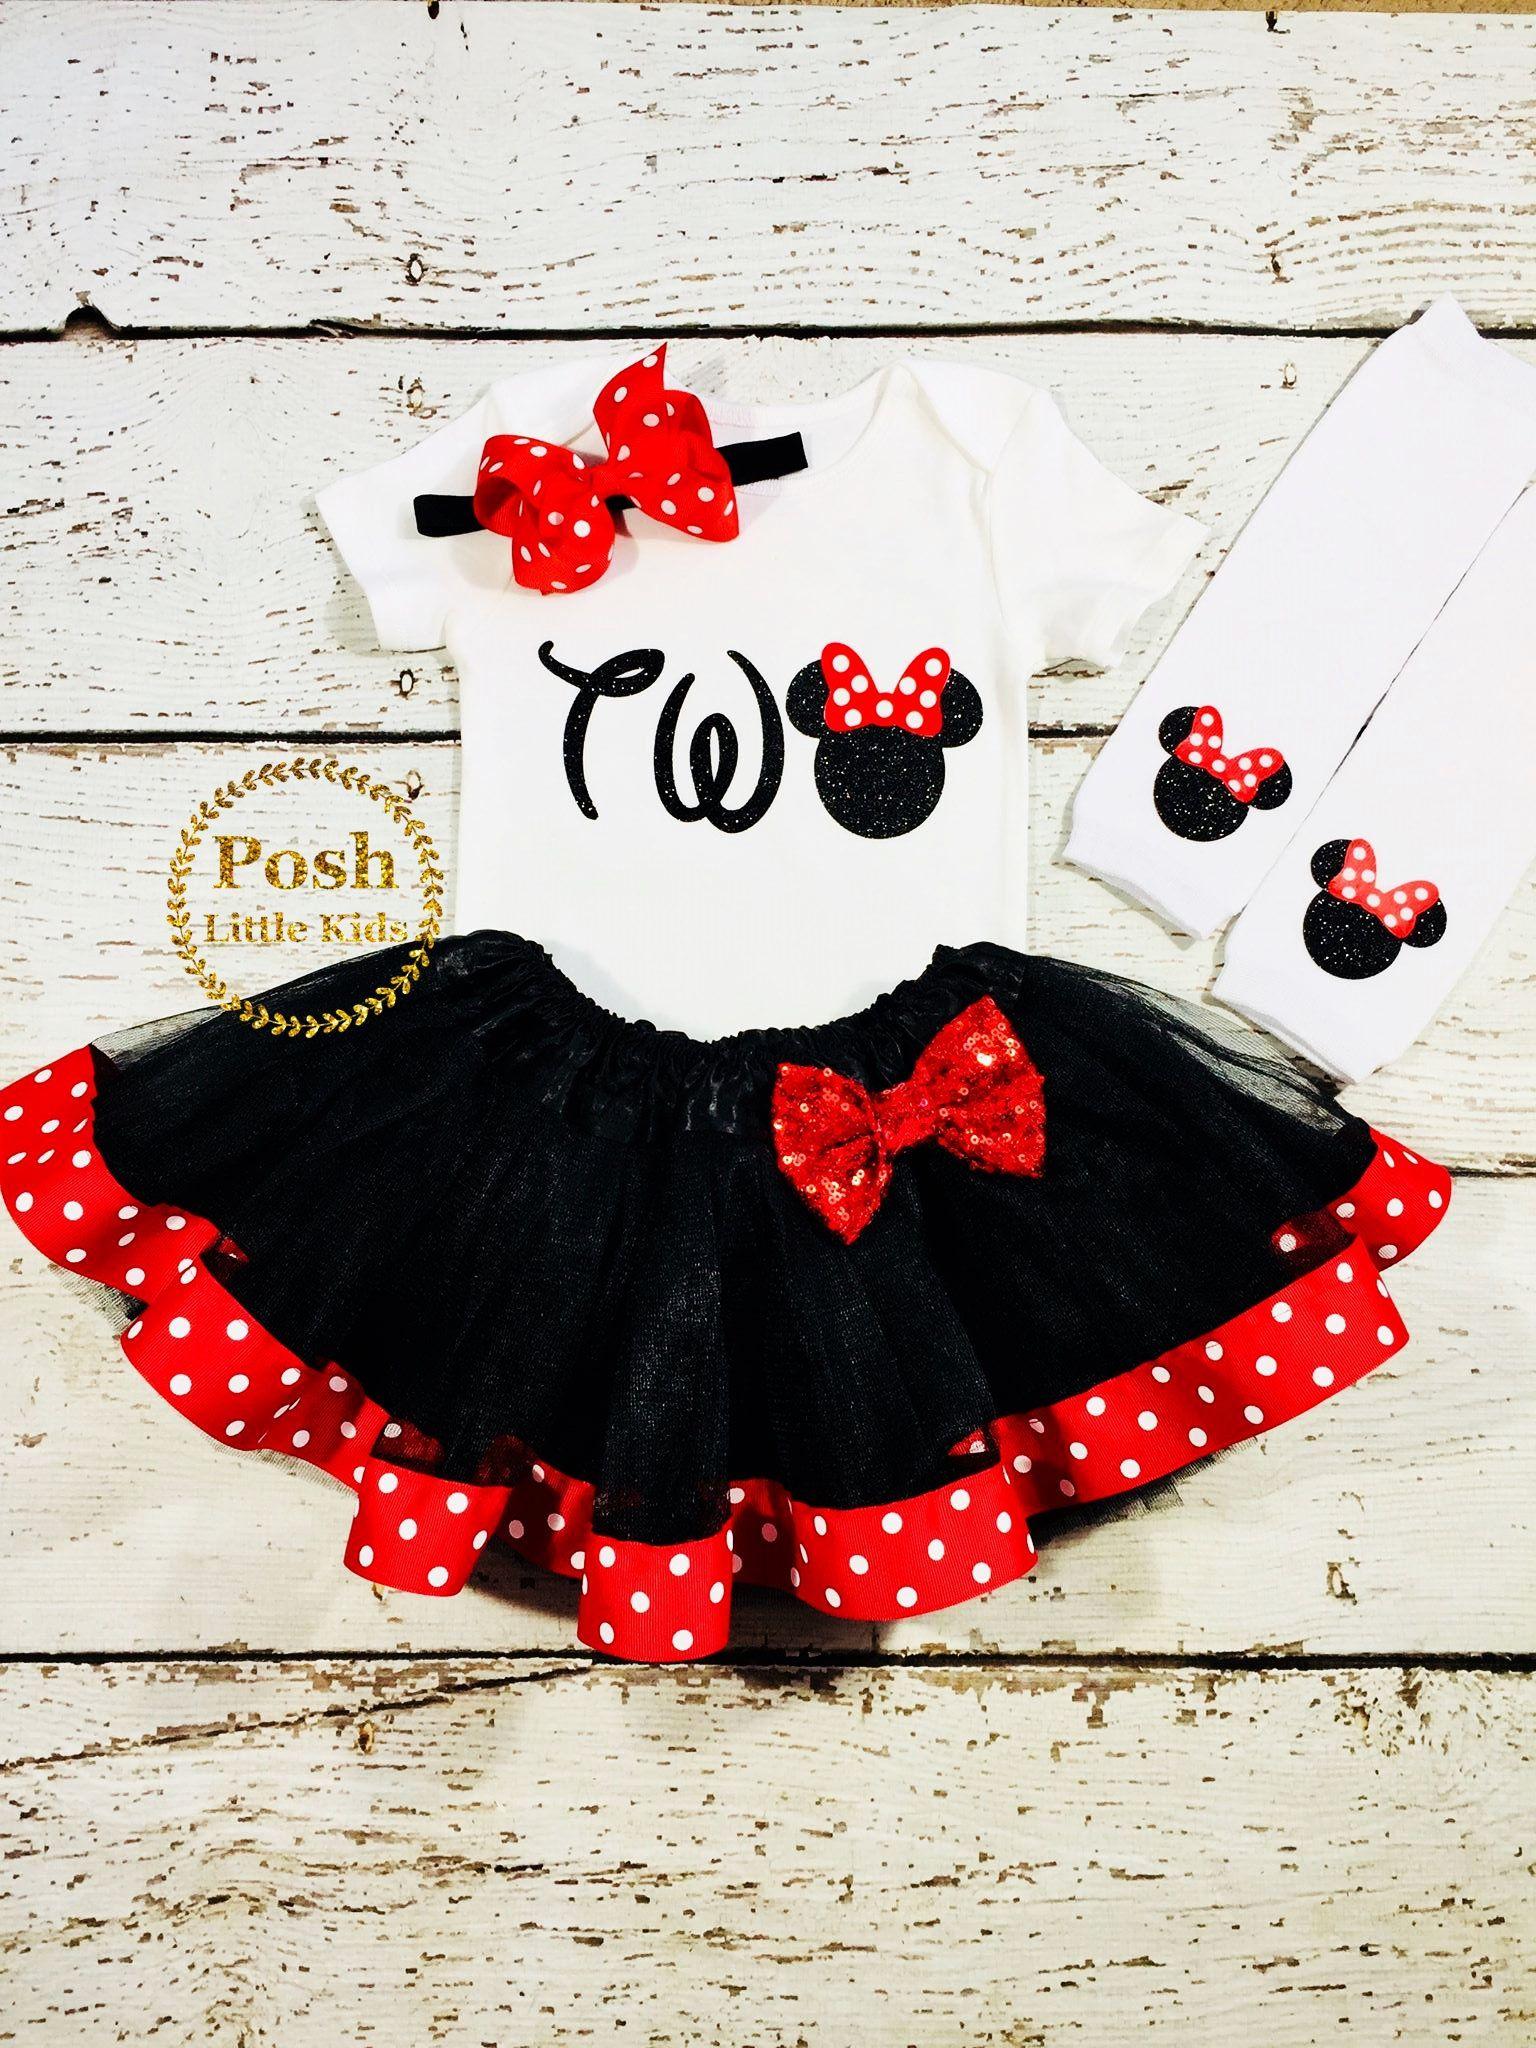 Minnie Mouse tutu set,minnie mouse 1st birthday outfit,cake smash outfit Minnie Mouse Birthday Outfit,Red /& Blac Minnie Mouse Outfit